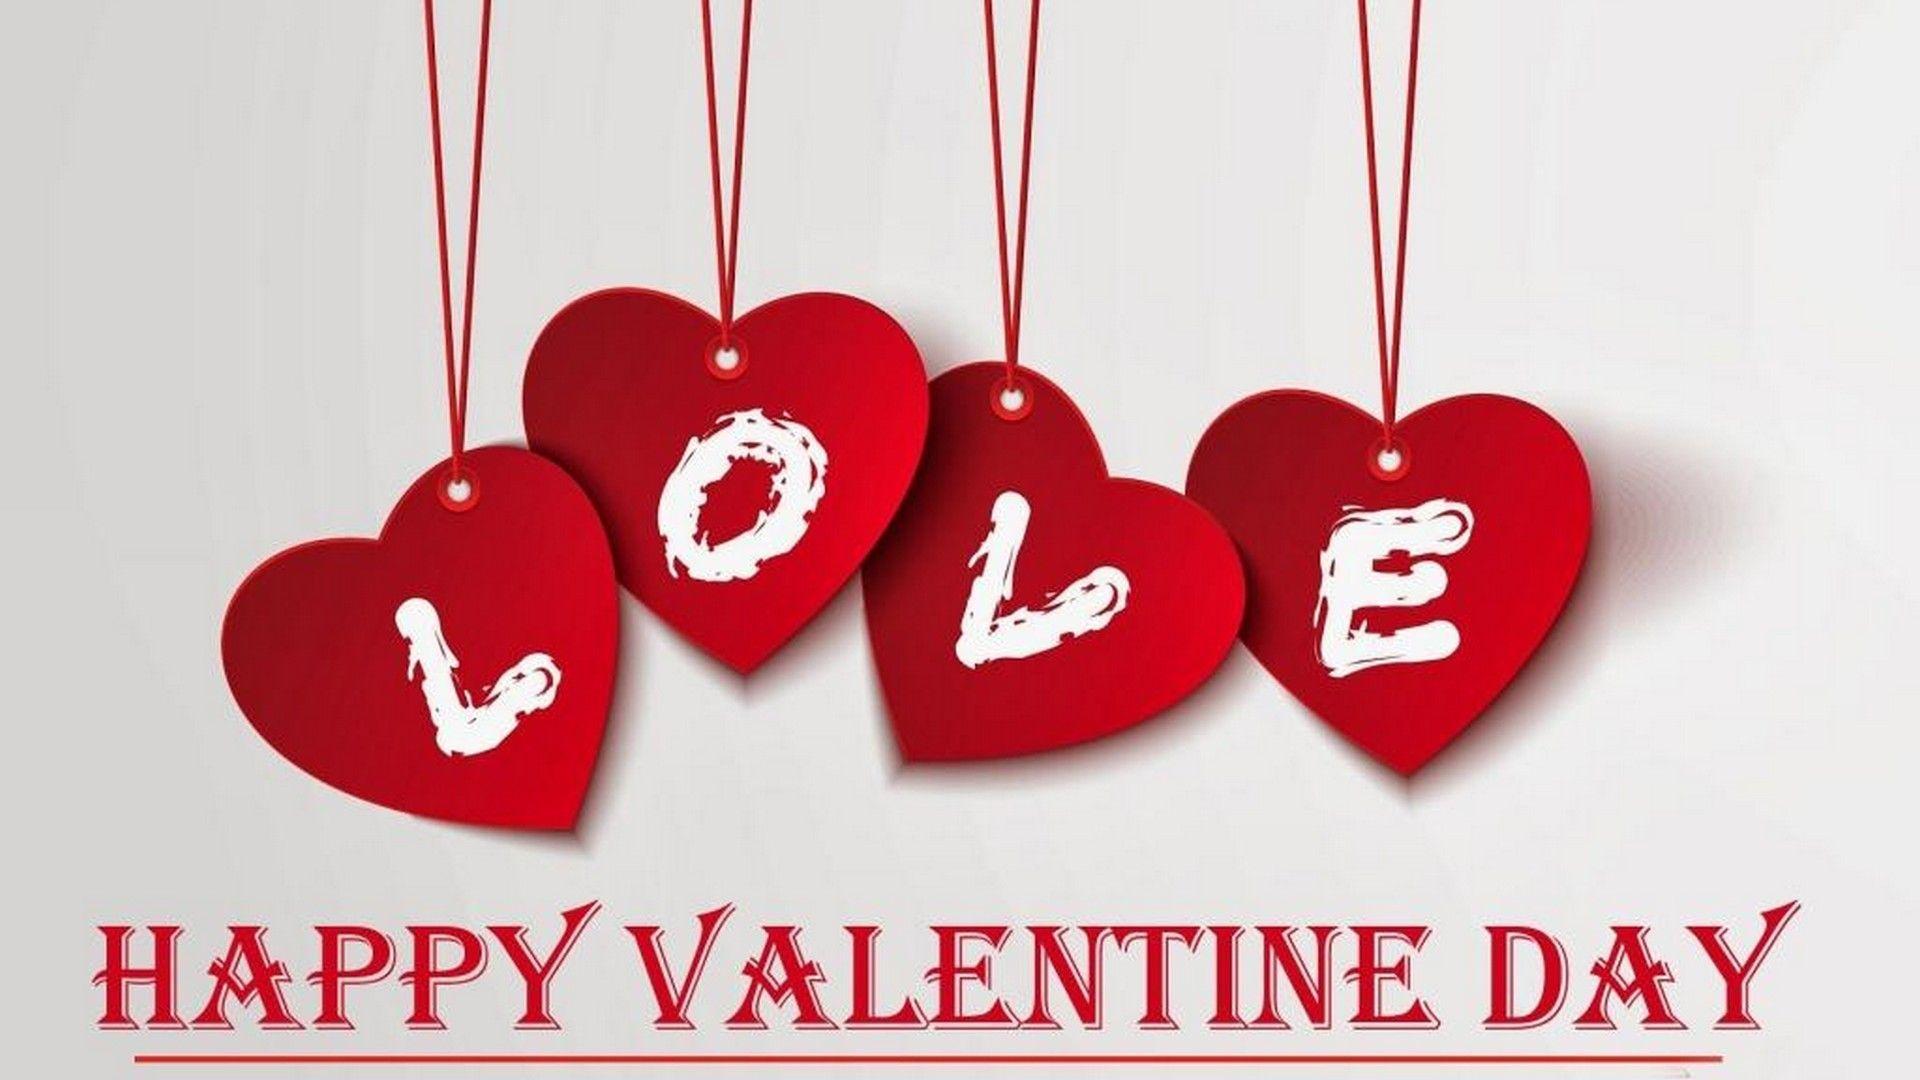 Cute Love Valentines Day Wallpaper Best Hd Wallpapers Happy Valentines Day Images Happy Valentines Day Wishes Happy Valentines Day Pictures